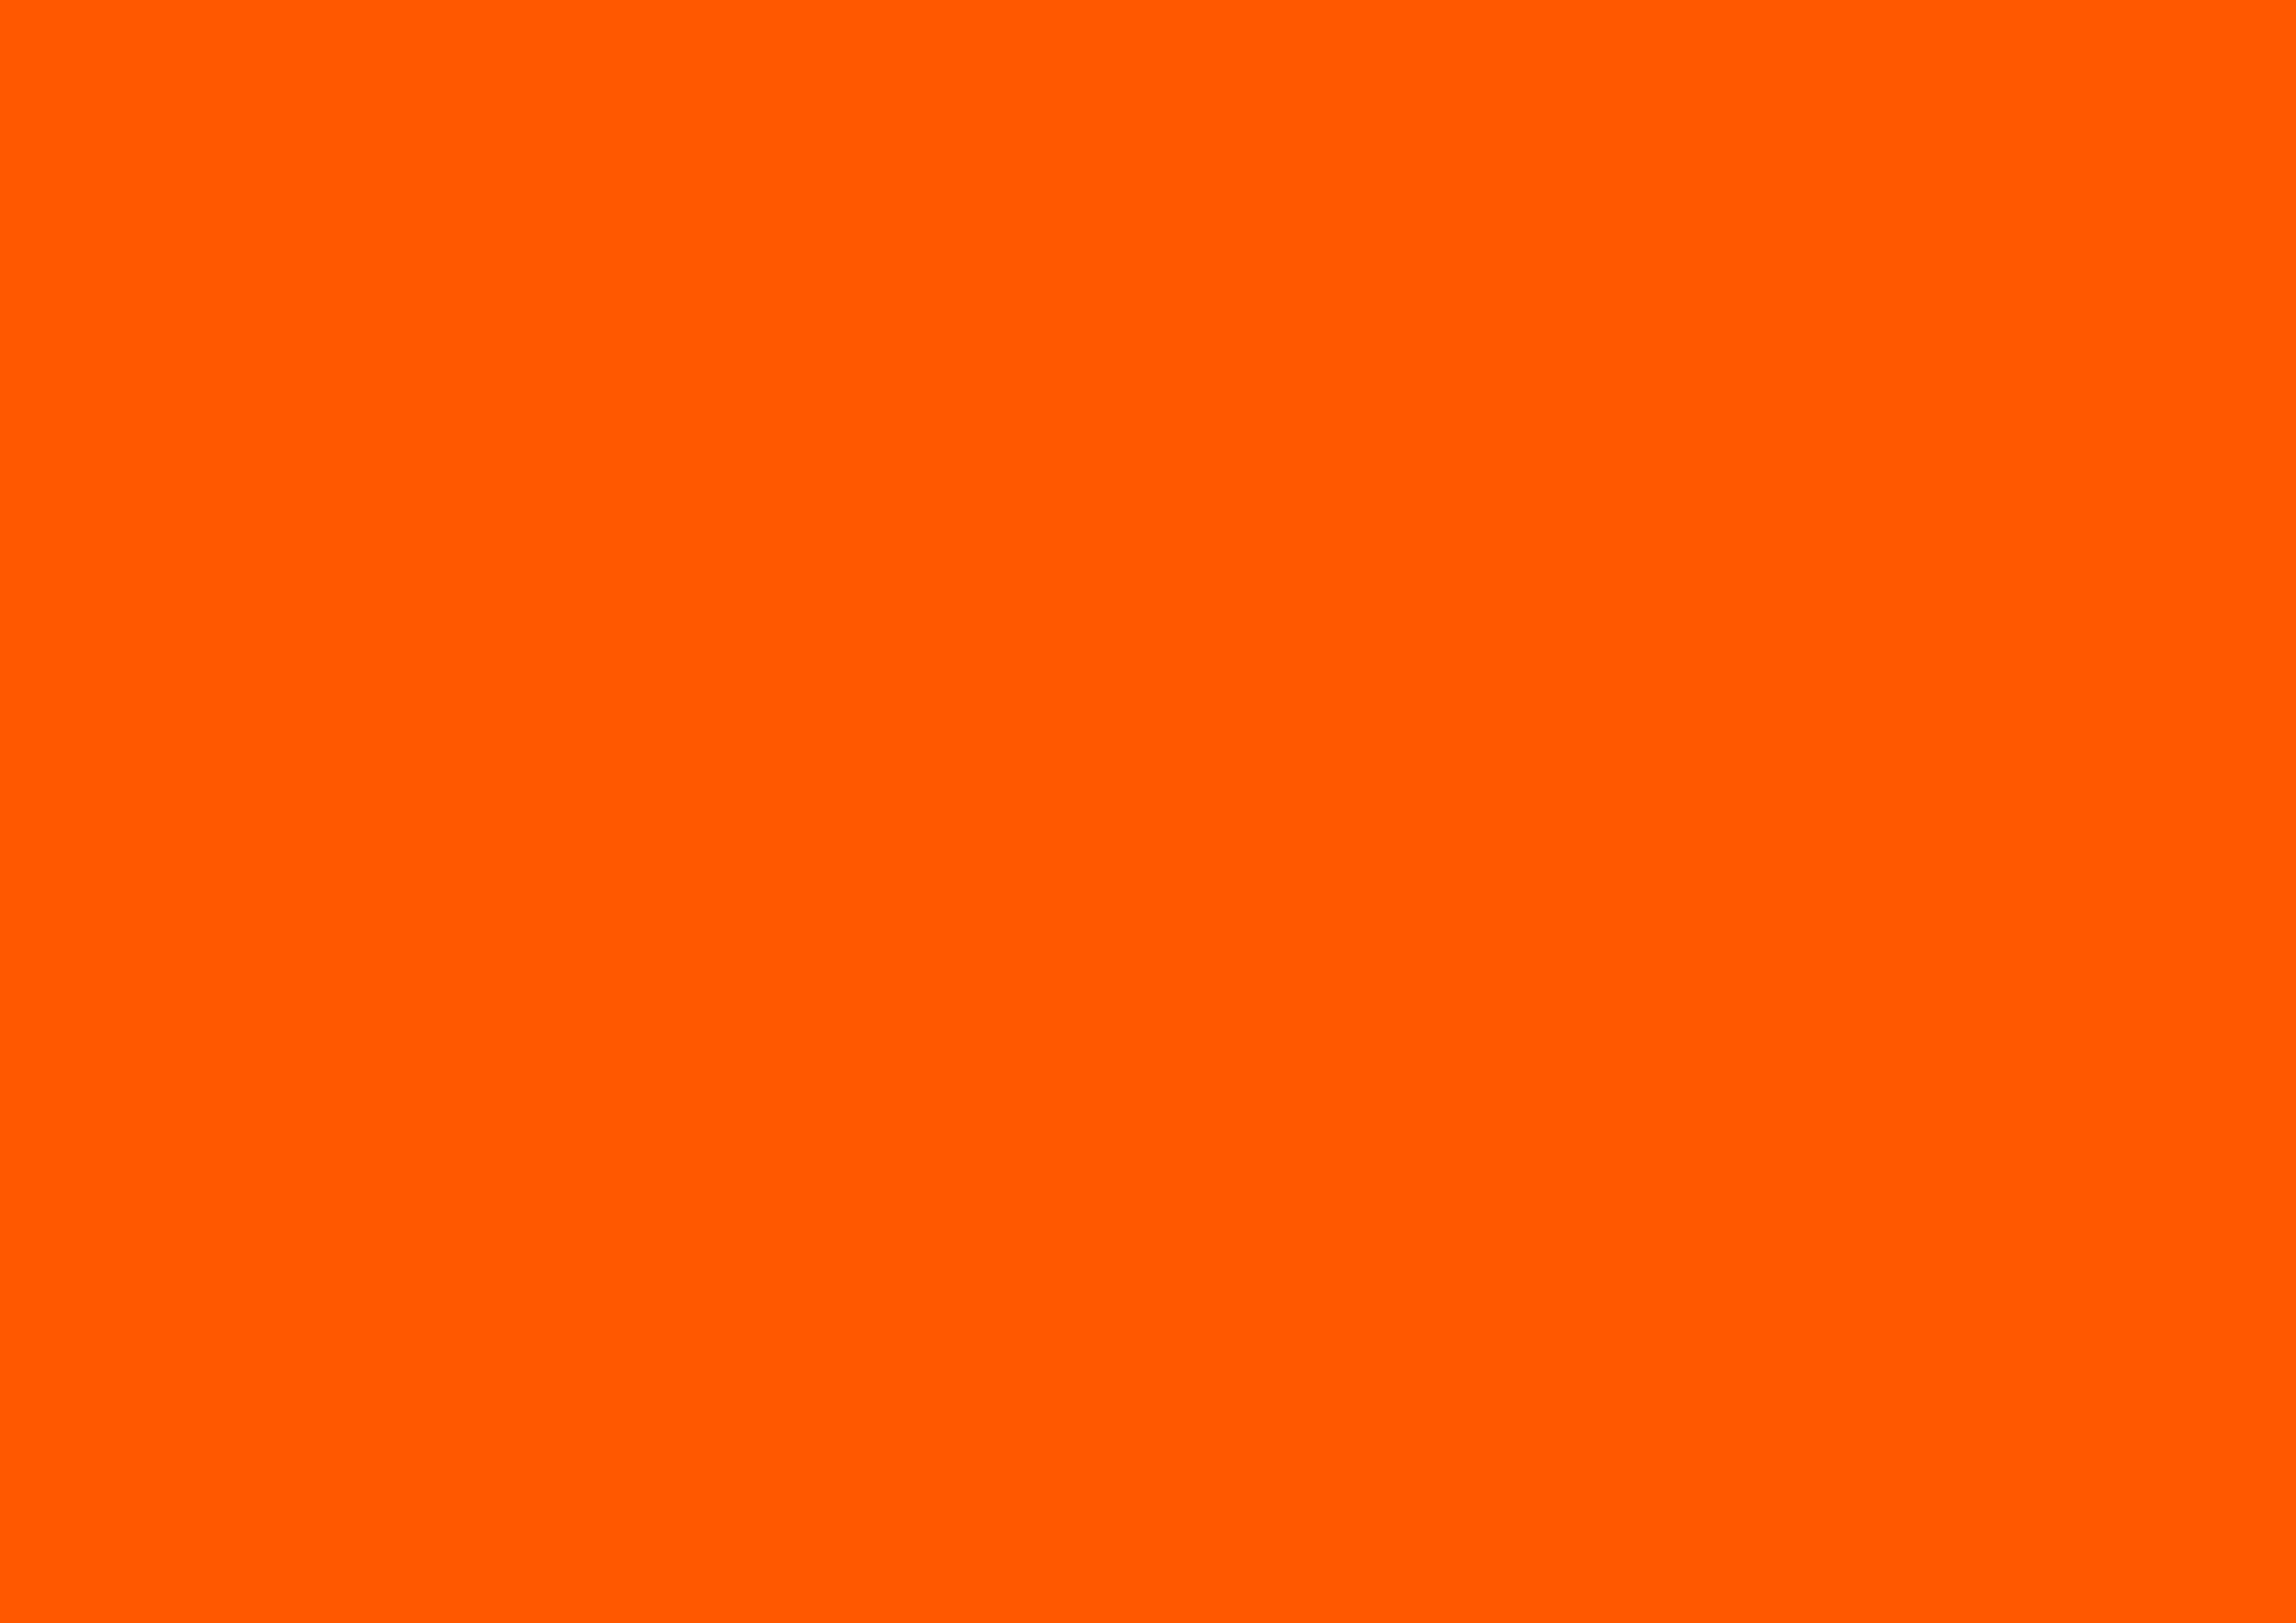 3508x2480 Orange Pantone Solid Color Background